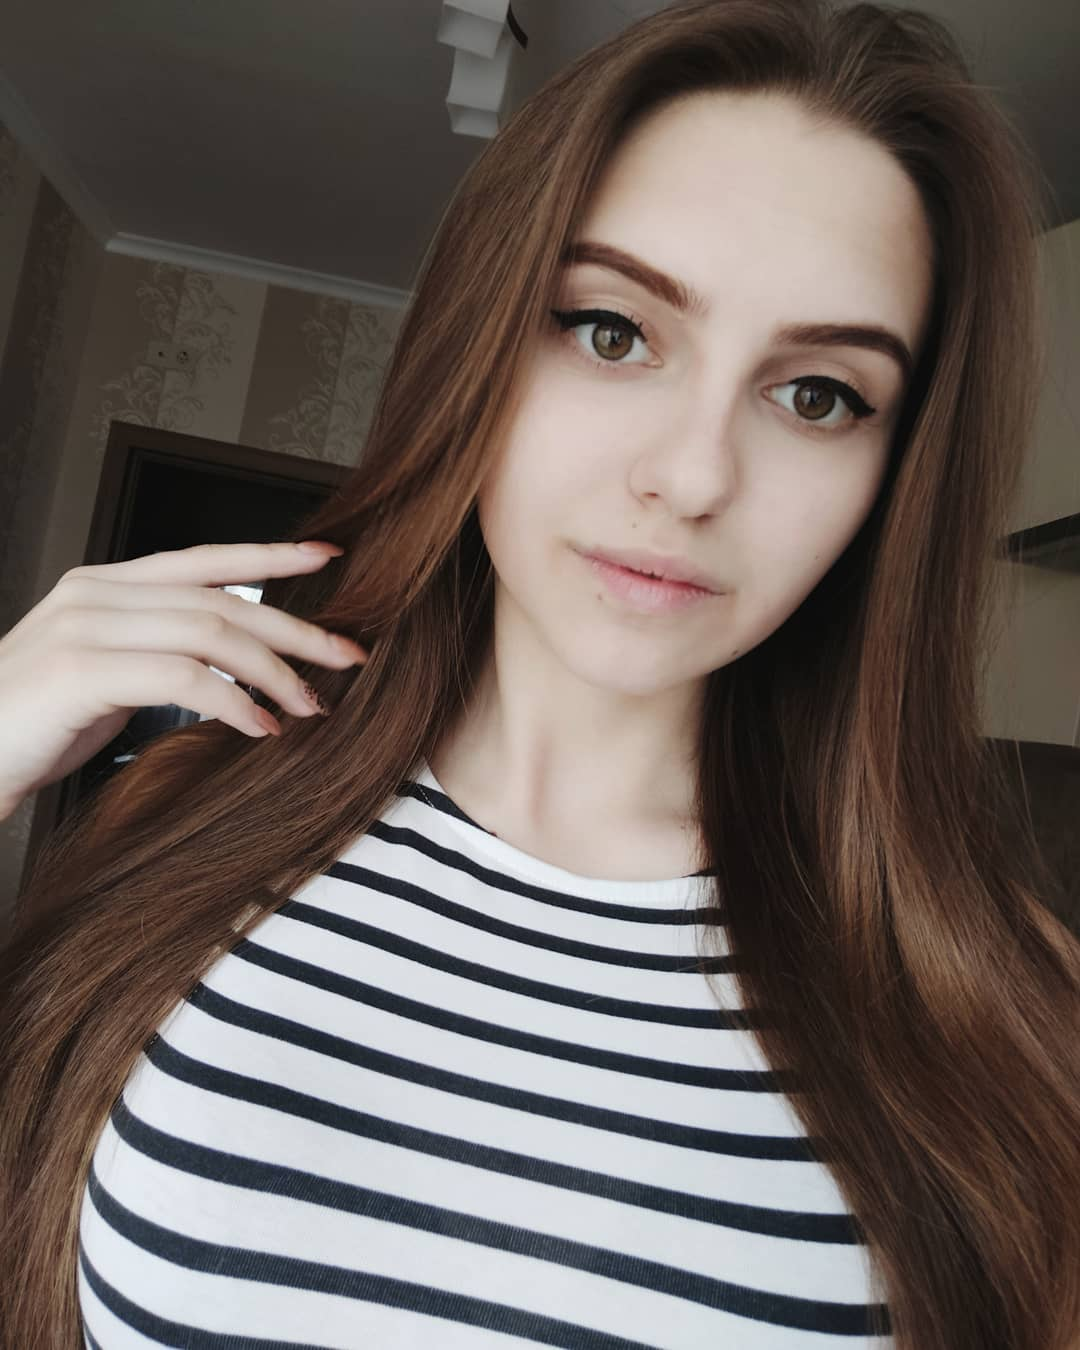 Katya-Melnyk-Wallpapers-Insta-Biography-11